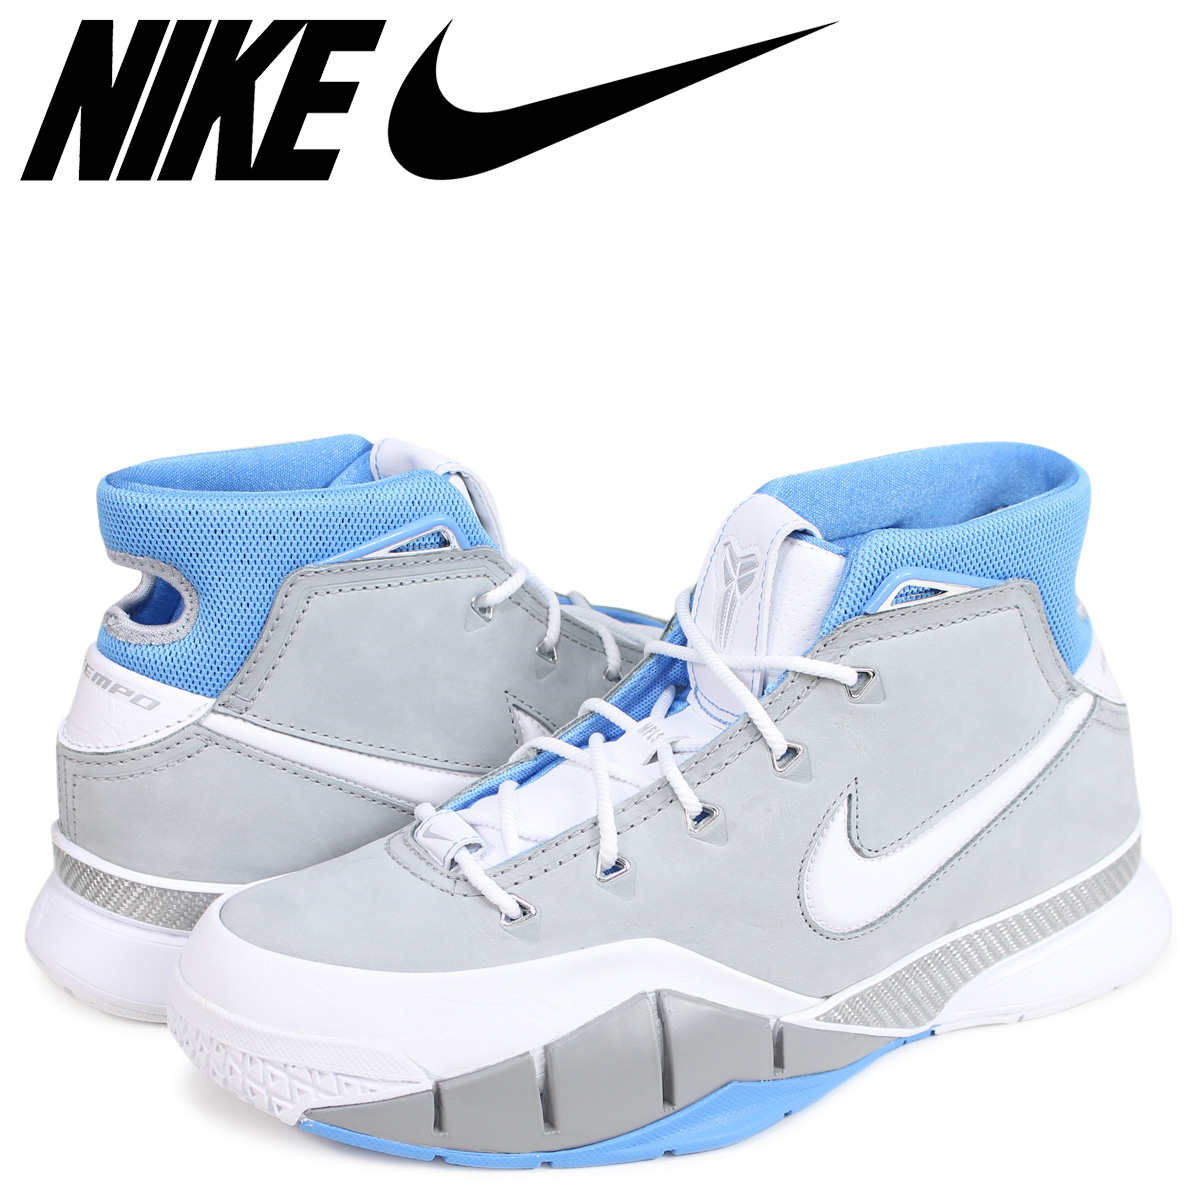 5c8017389164 Sugar Online Shop  NIKE Nike Corby 1 sneakers KOBE 1 PROTRO MPLS ...